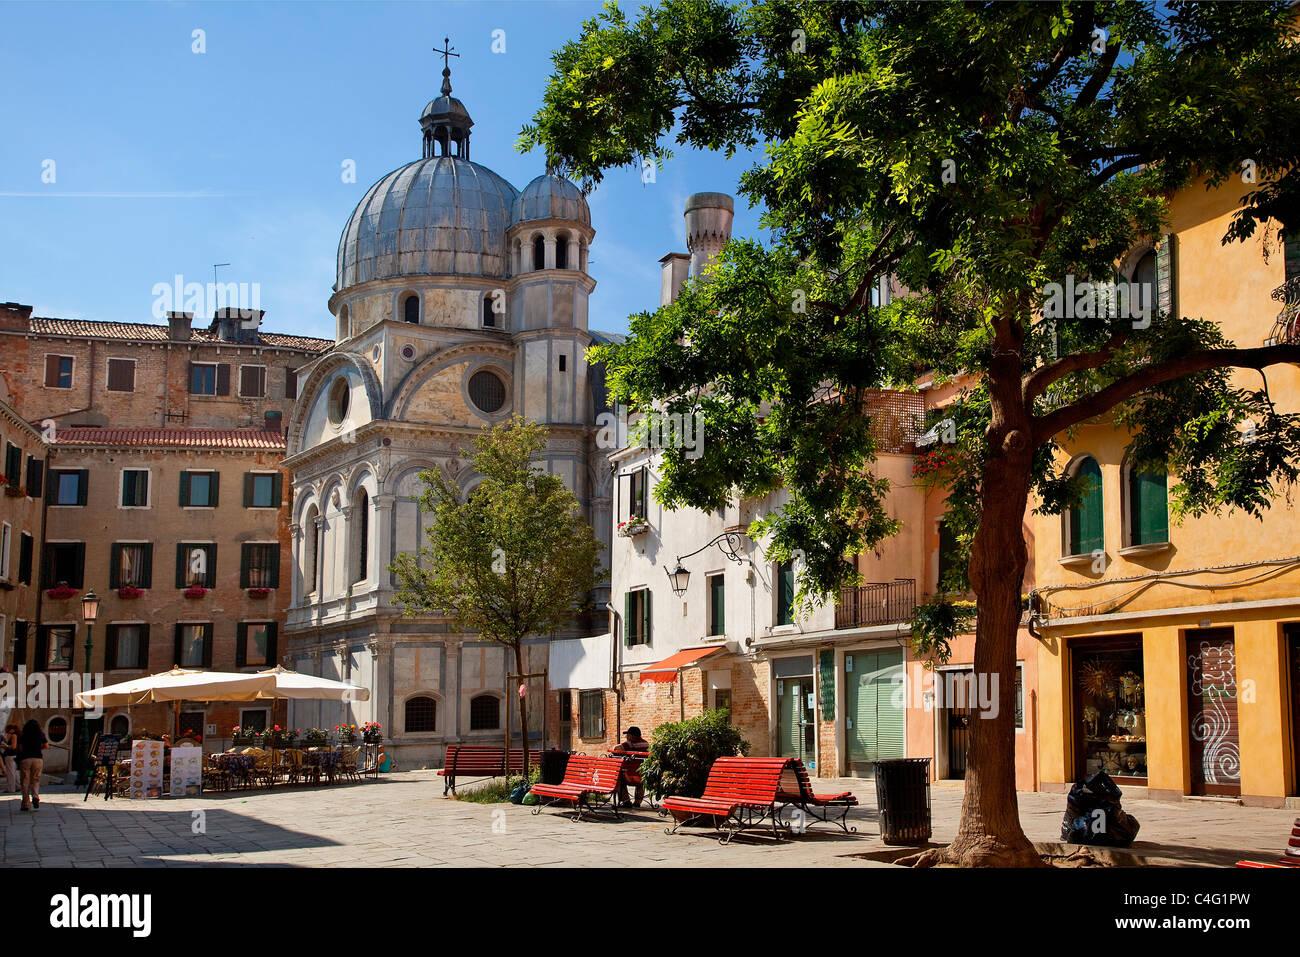 Venice, Campo Santa Nova - Stock Image